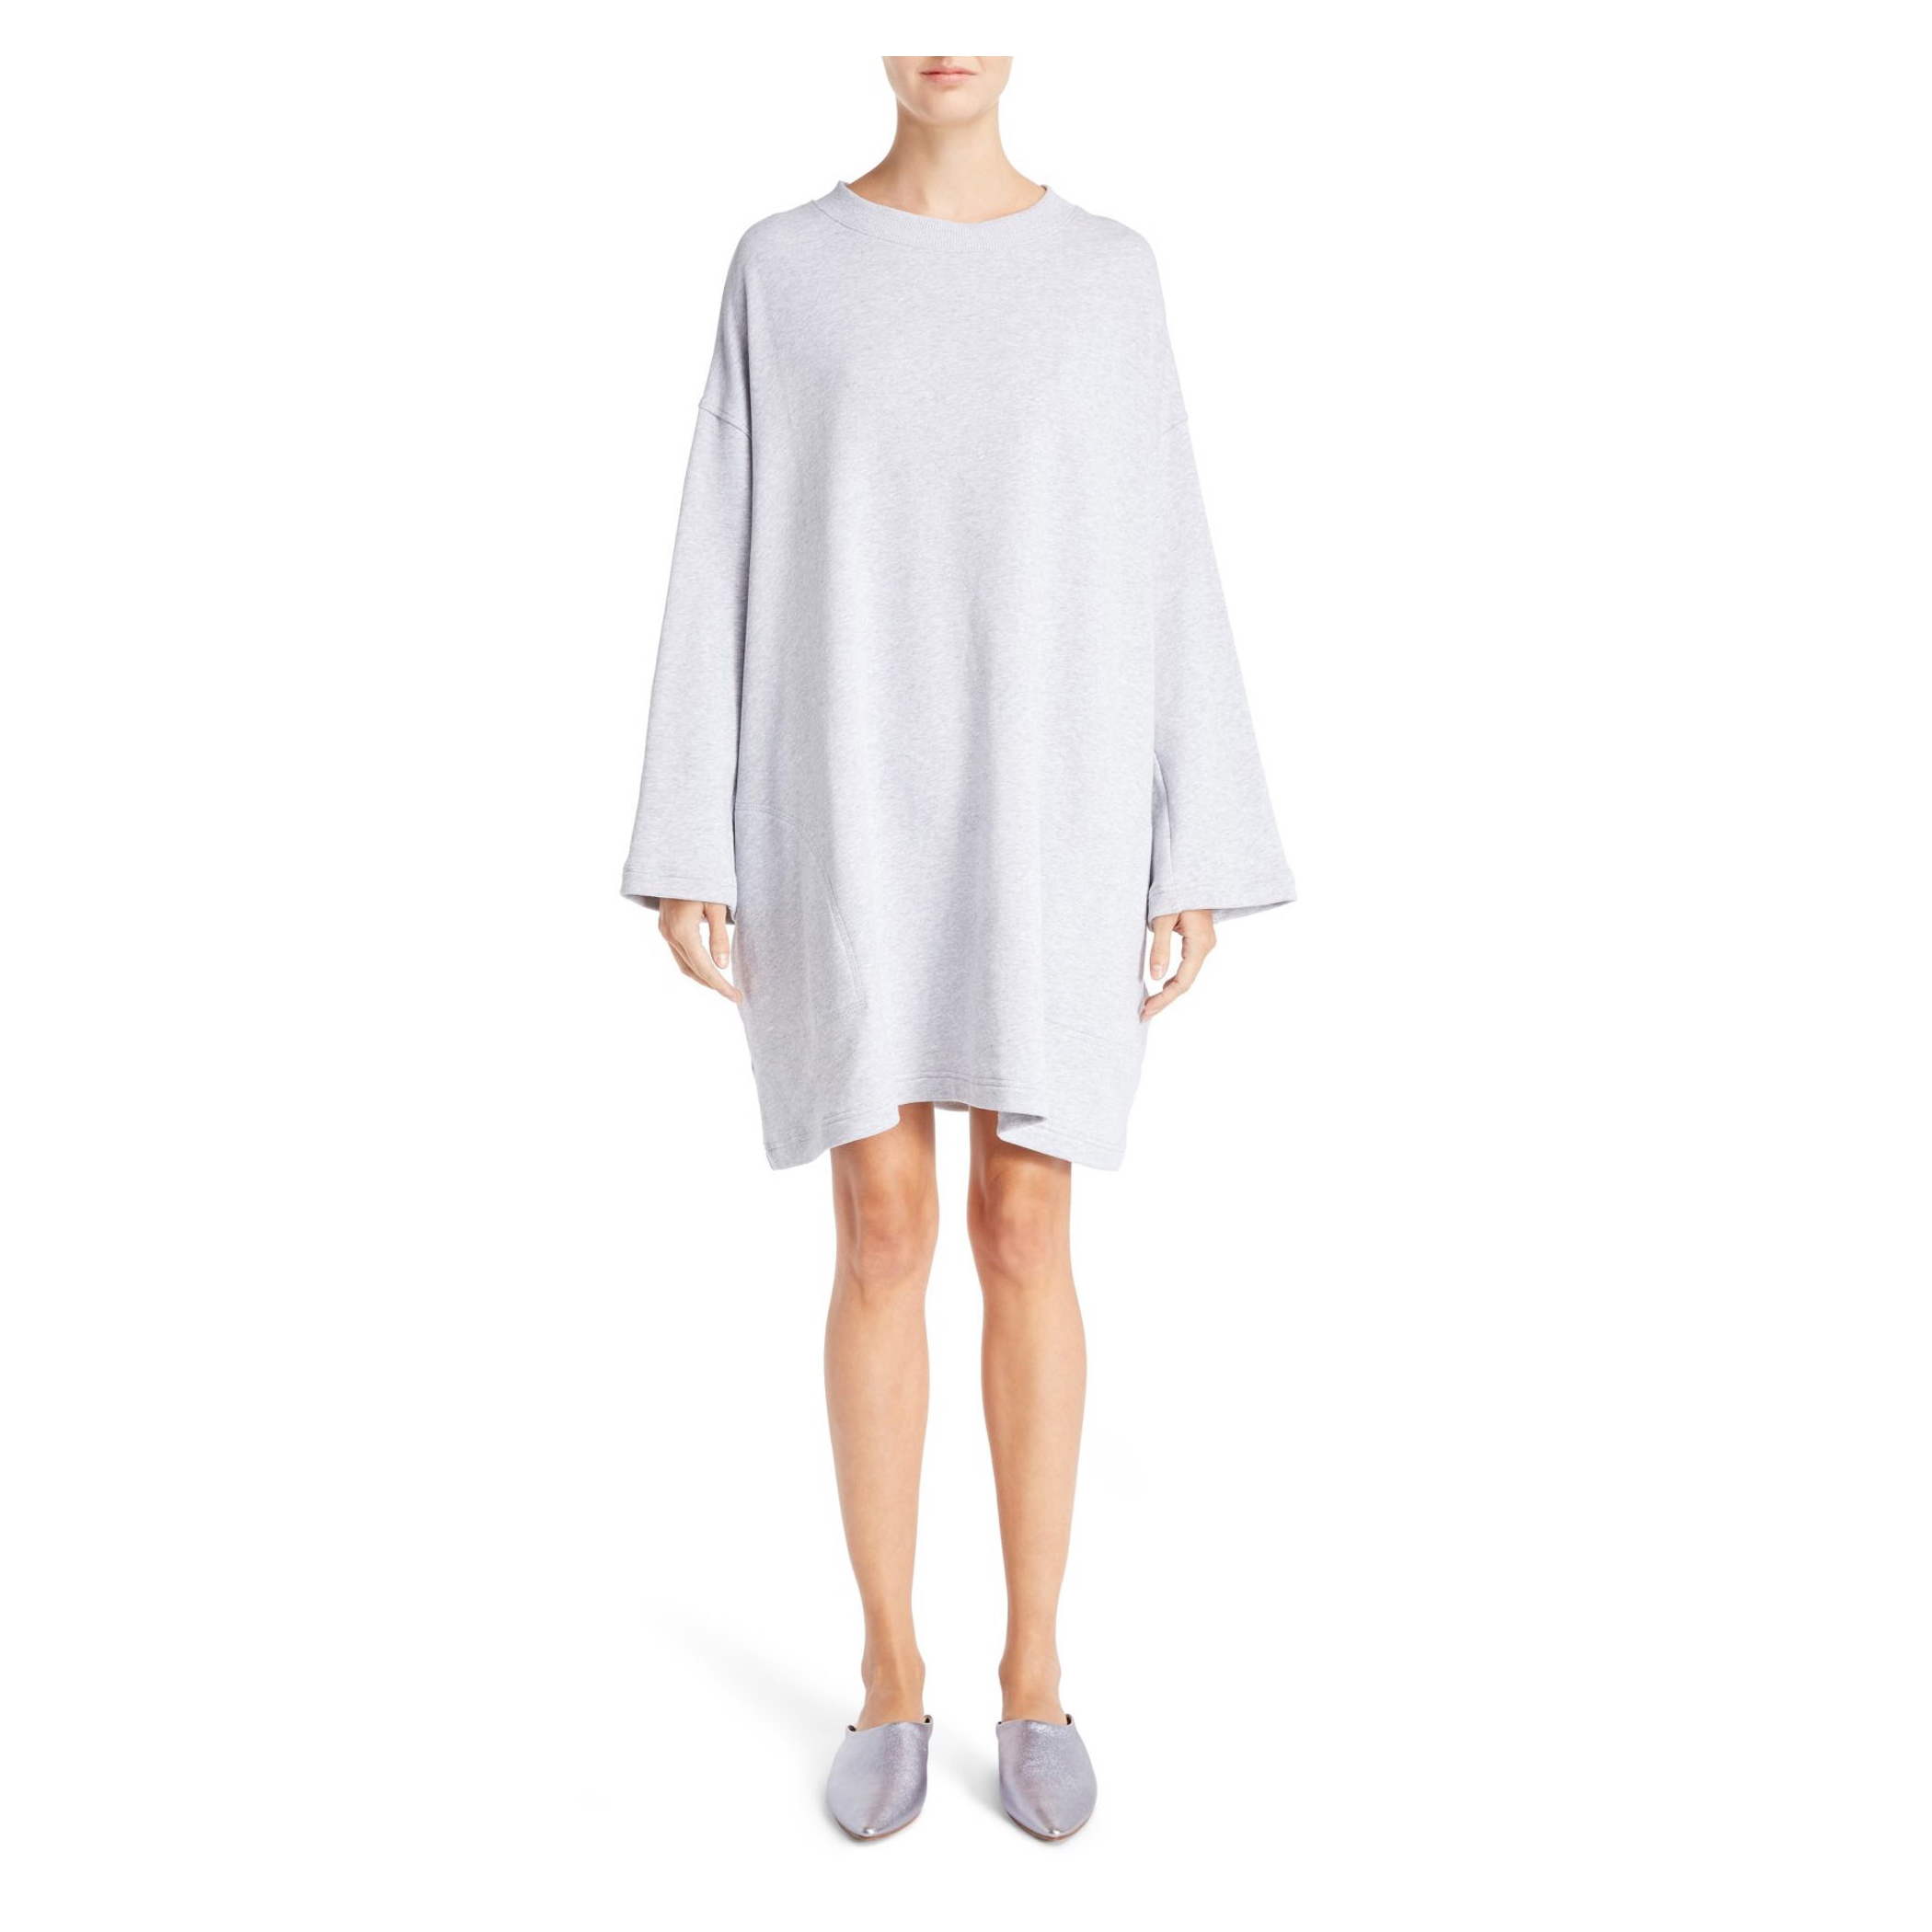 1e75f0c1275 ACNE STUDIOS Leyla Sweatshirt Dress - ShopPulp